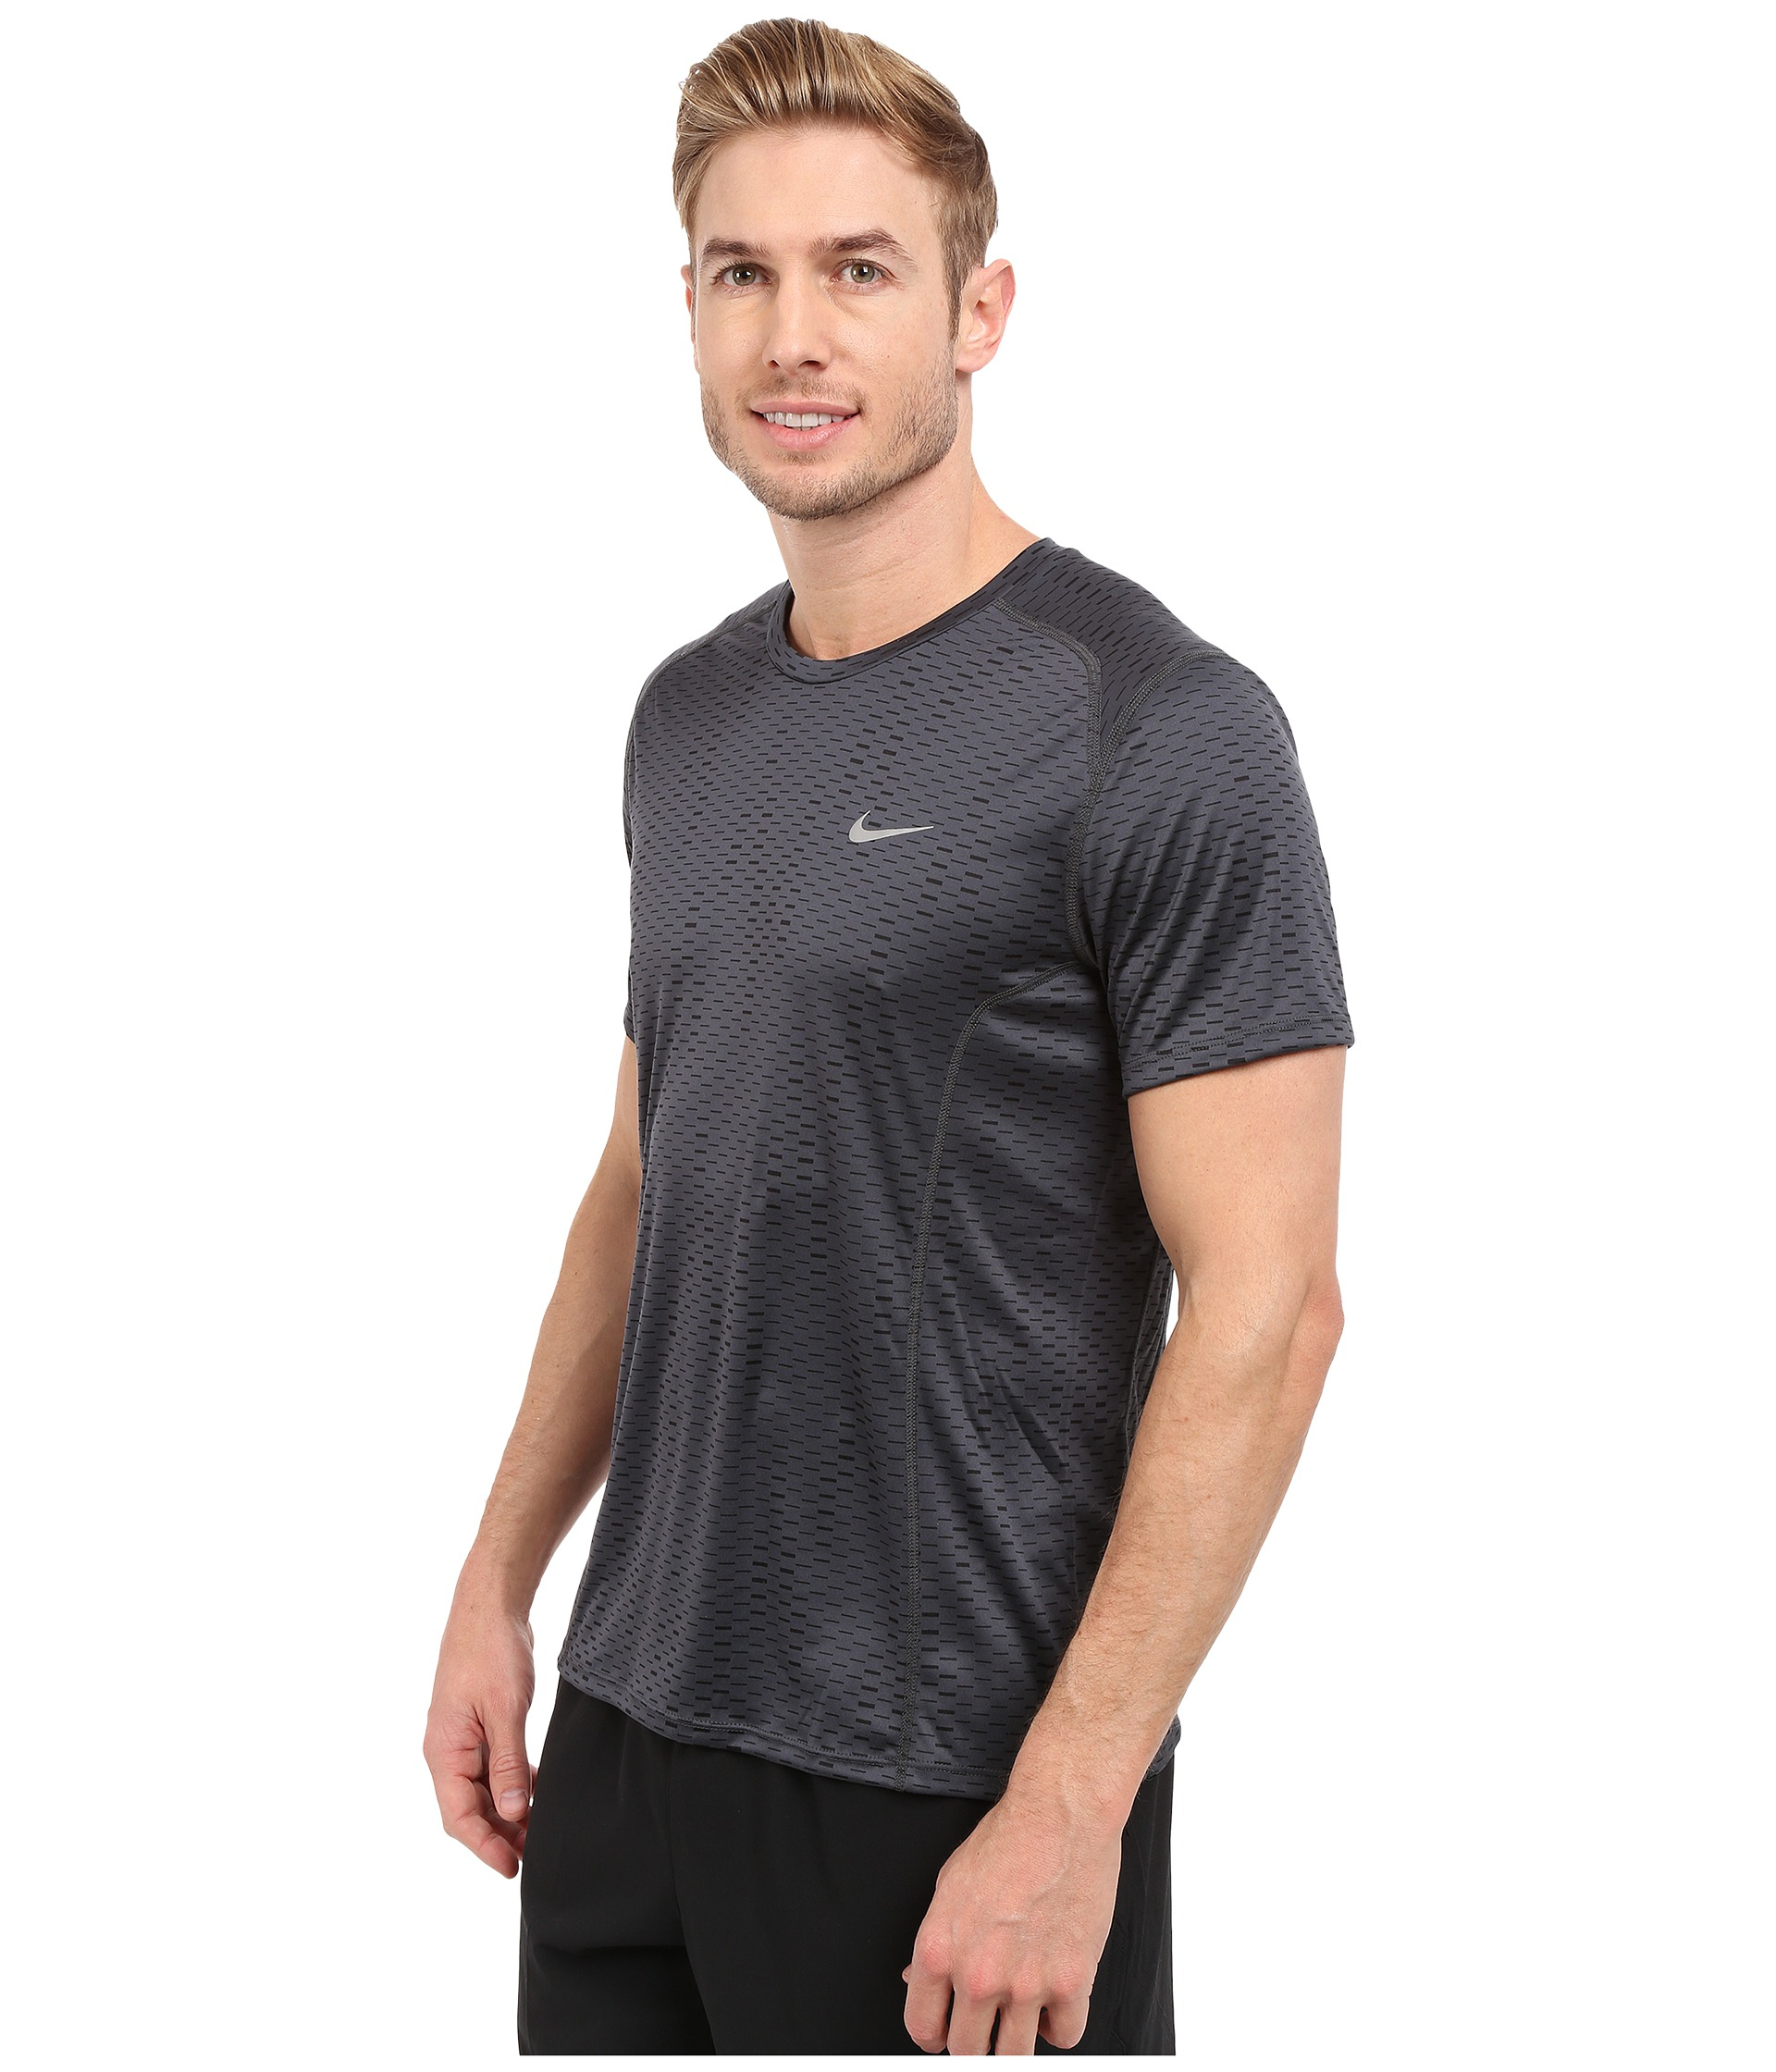 9c928affa469b Nike Womens Dri Fit Miler Short Sleeve Running Shirt - raveitsafe